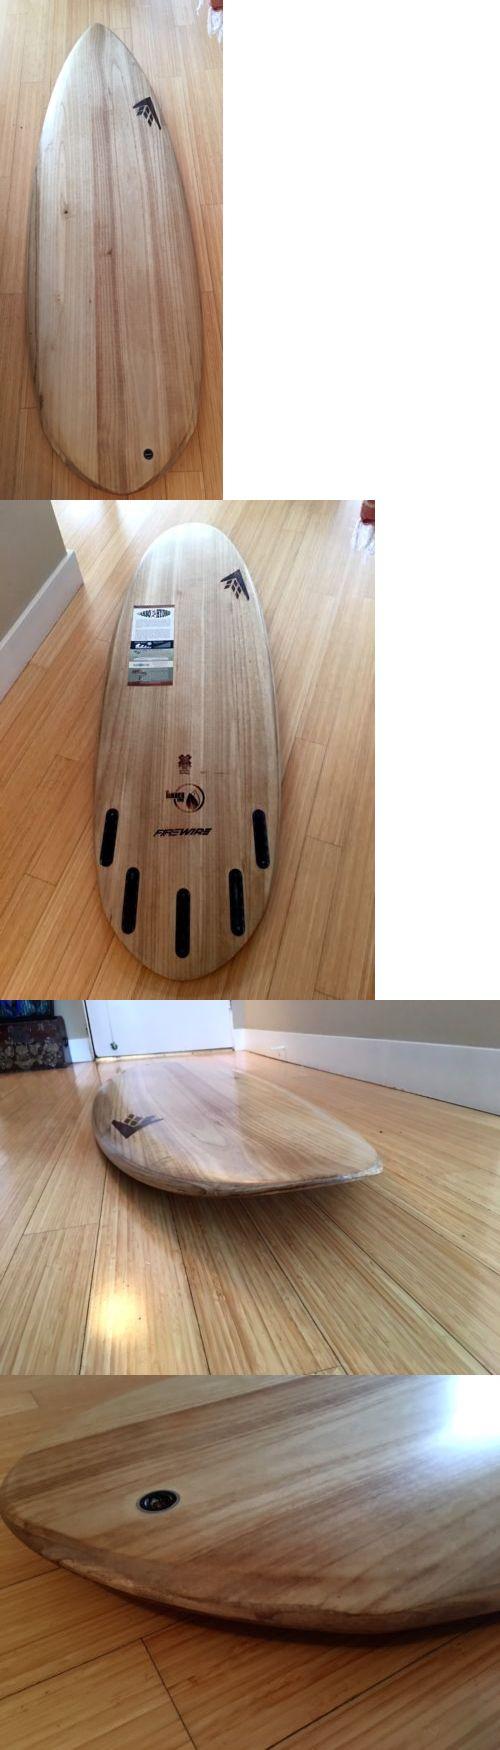 Surfboards 22710: Firewire Timbertek Carbo Hydro Surfboard Brand New 5 7 5 8 -> BUY IT NOW ONLY: $533 on eBay!